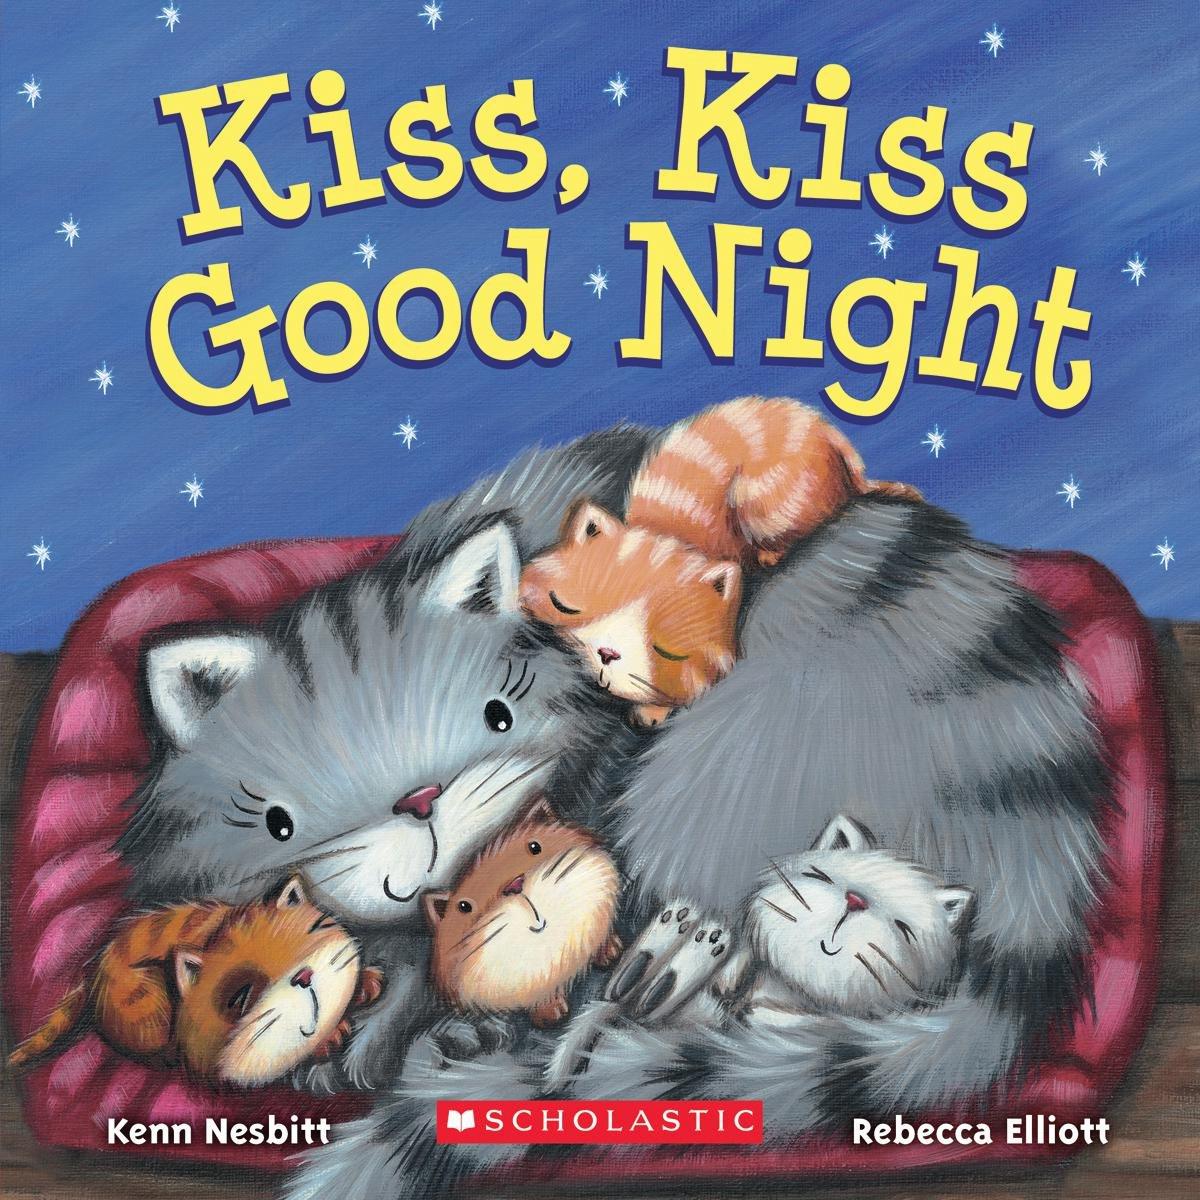 Good Night Kiss Cartoon Images